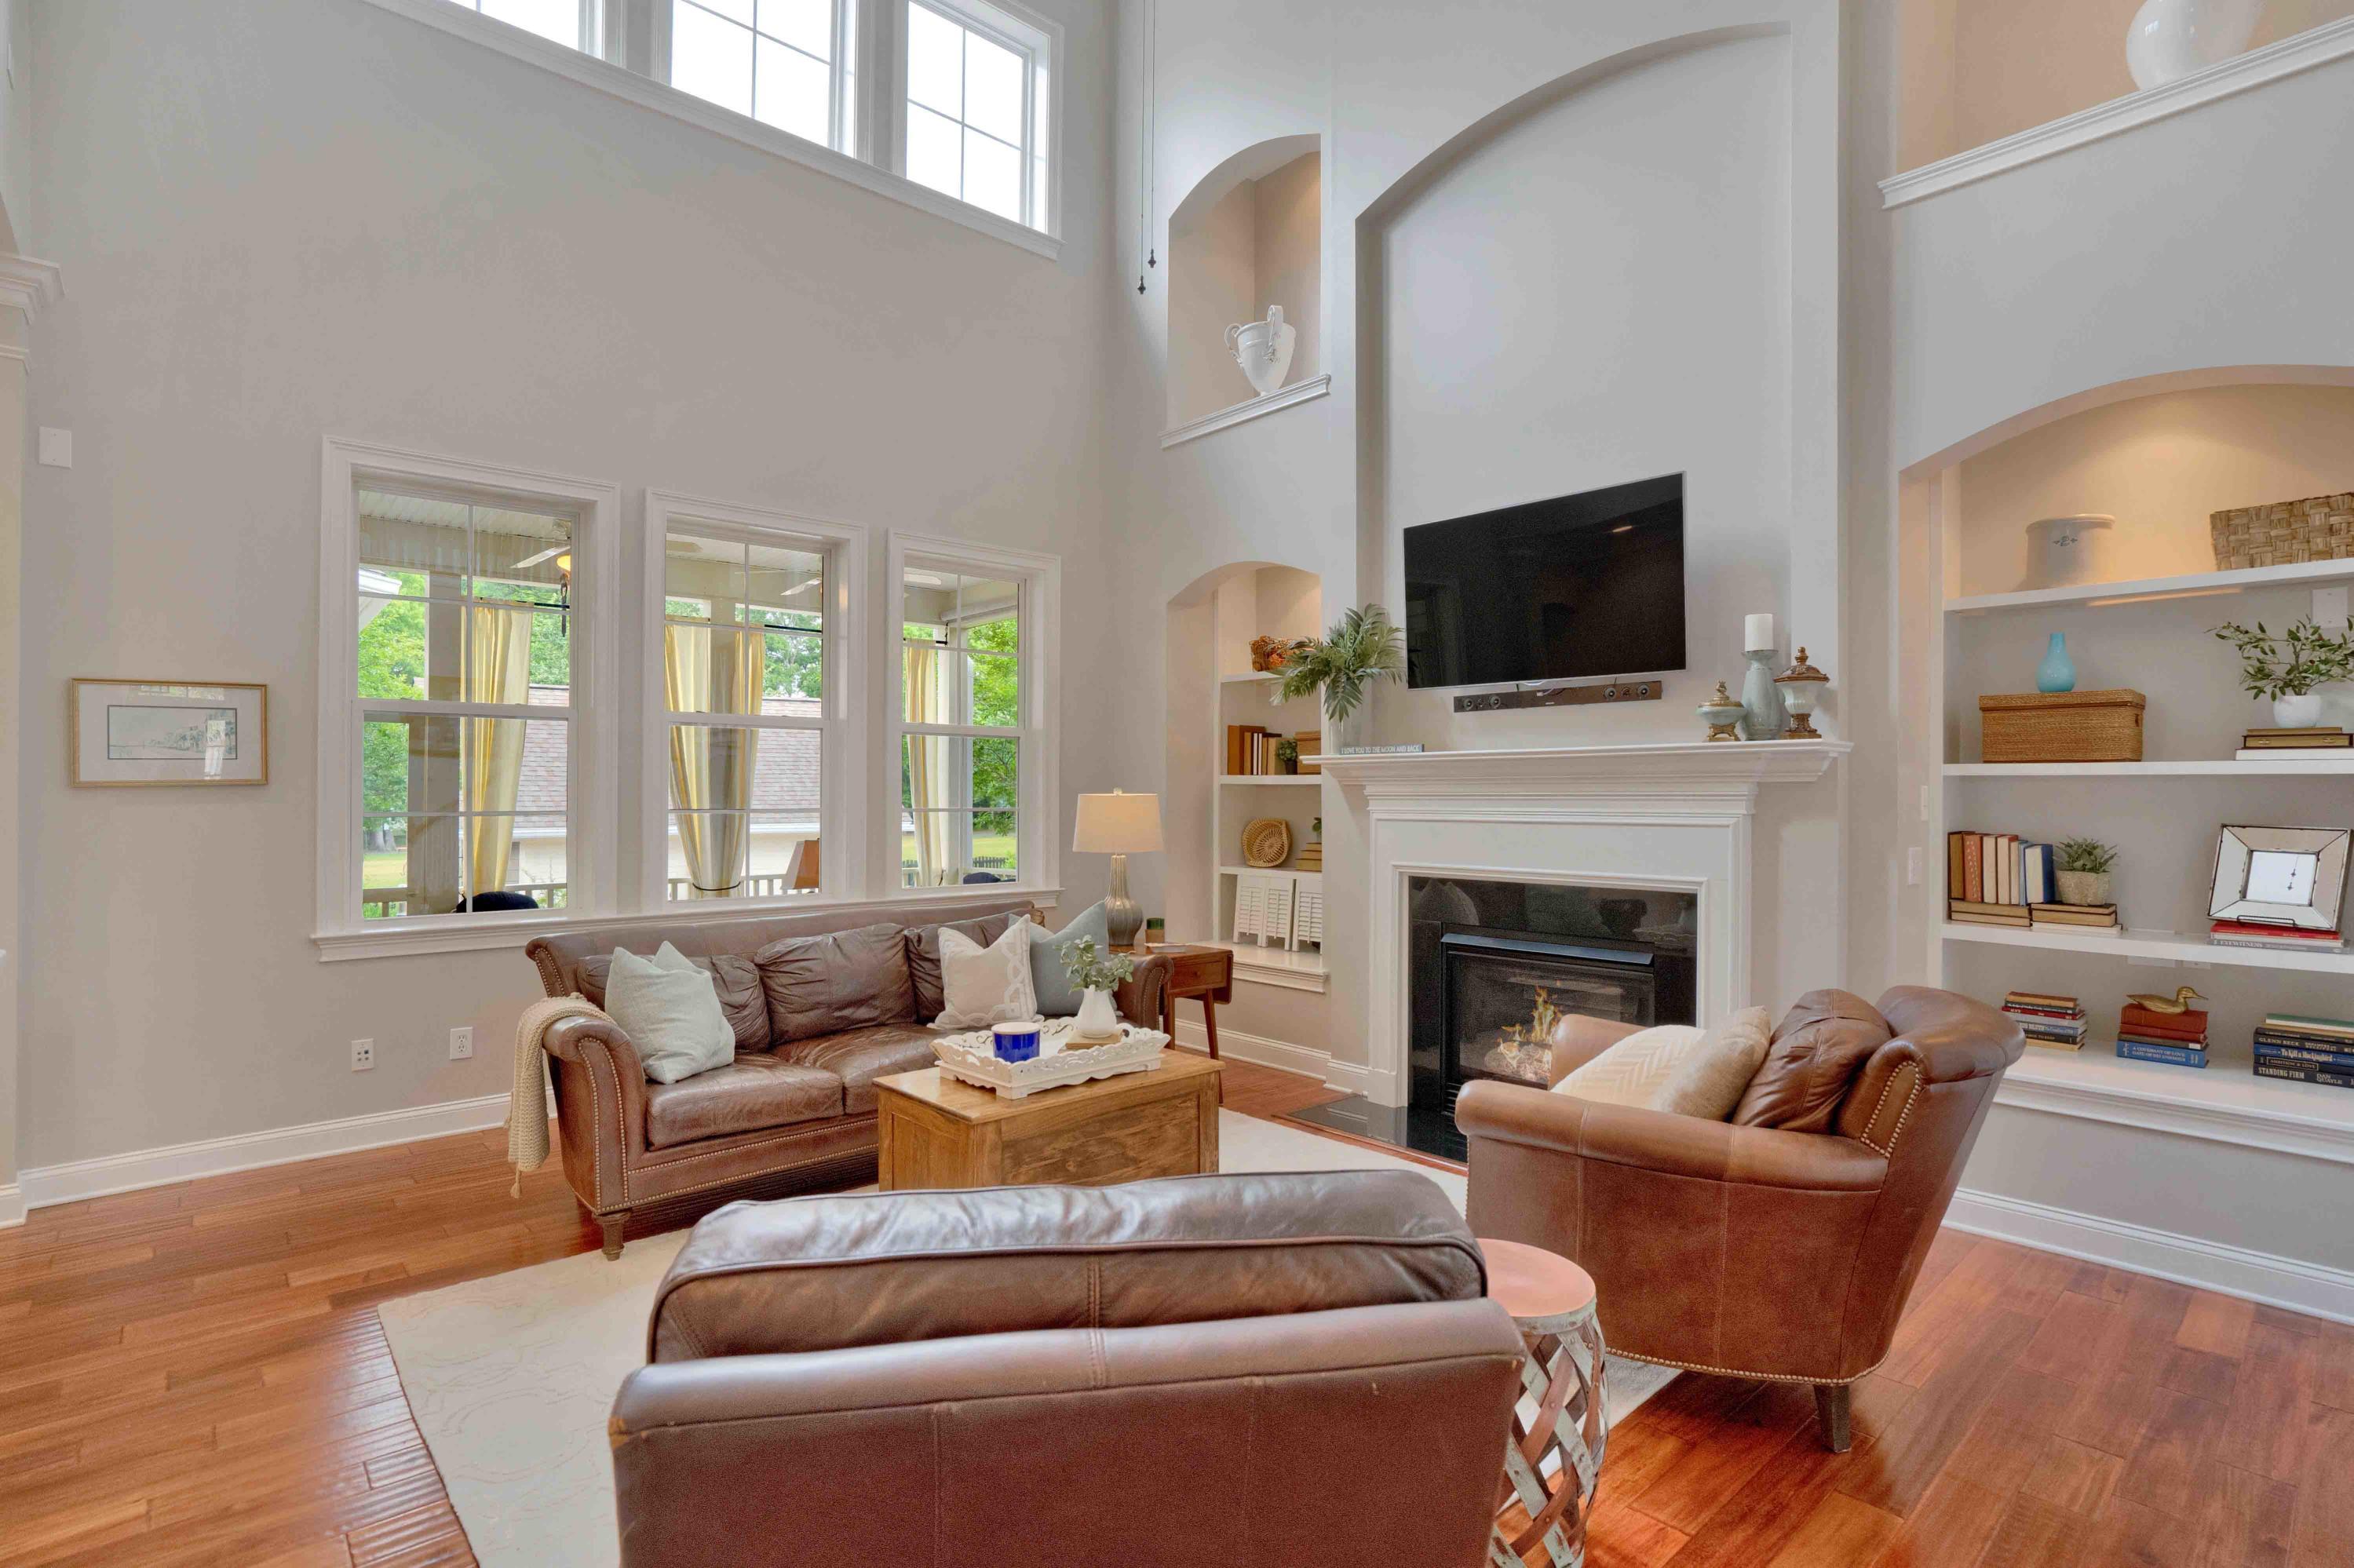 Daniel Island Homes For Sale - 8005 Gibbon, Daniel Island, SC - 1